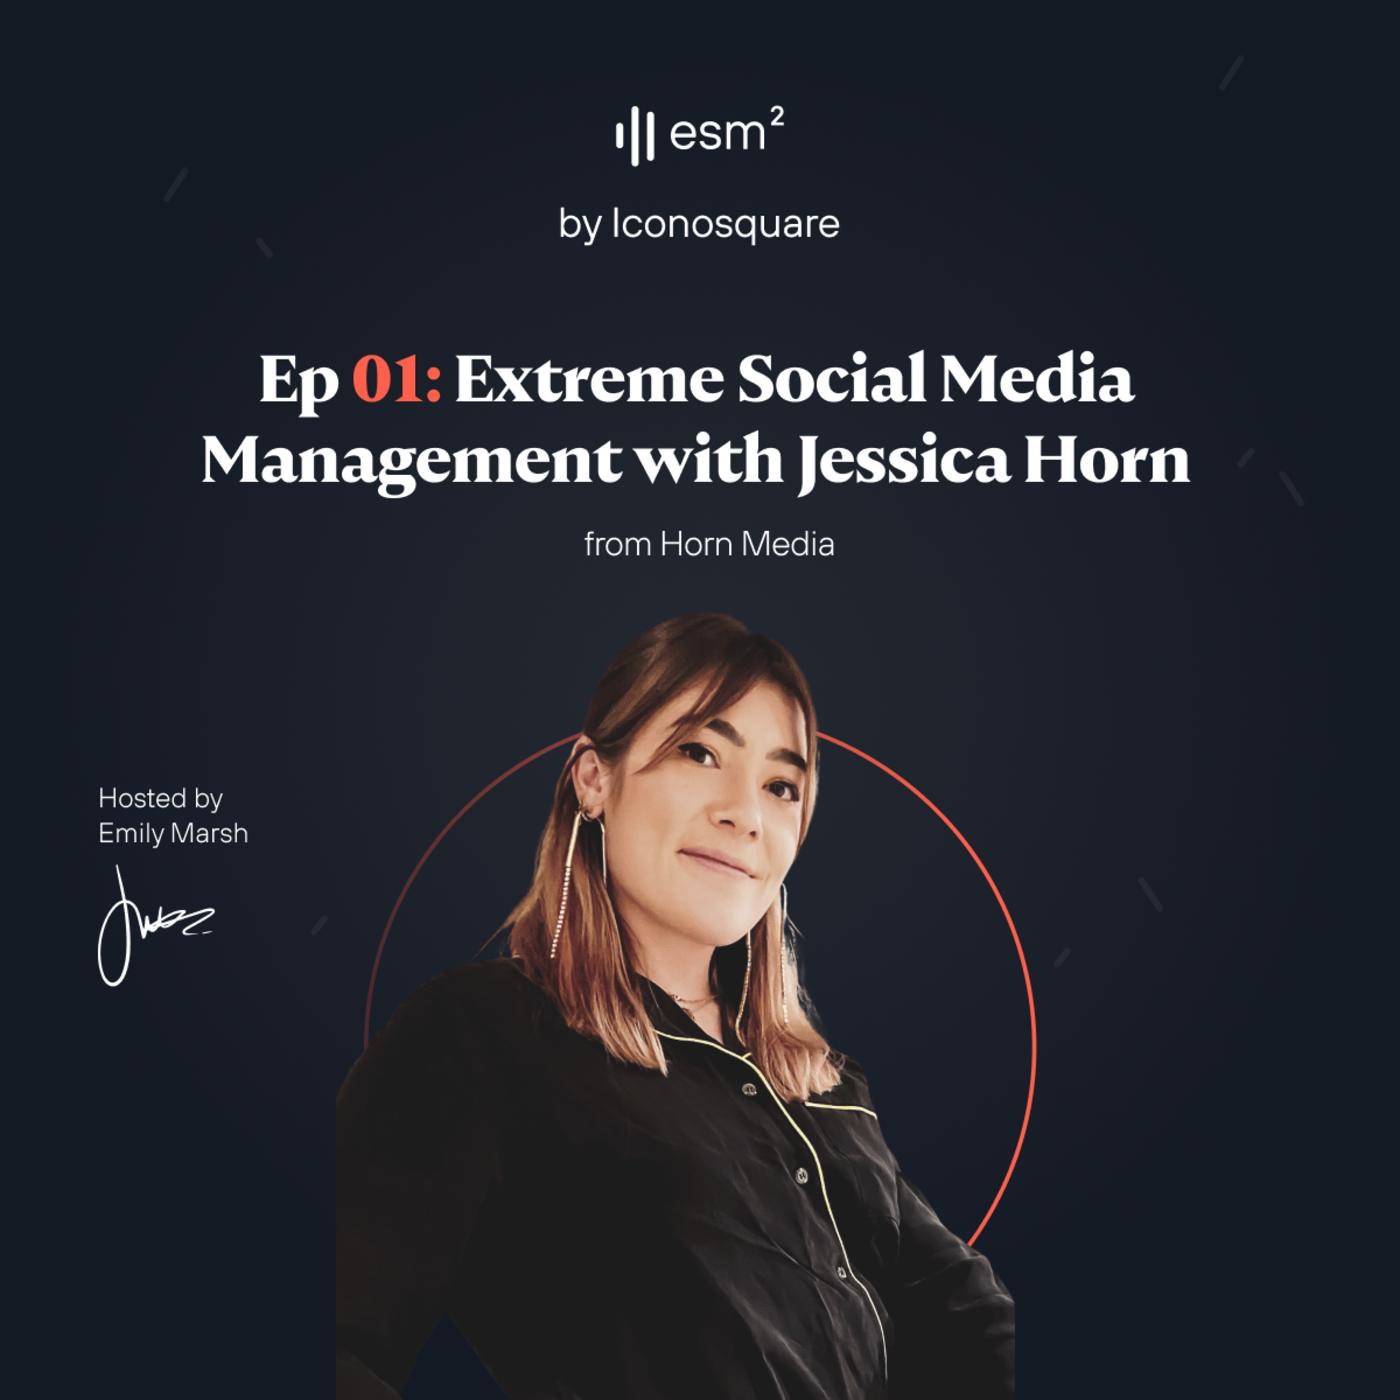 """Extreme social media management"" - Jessica Horn from Horn Media"